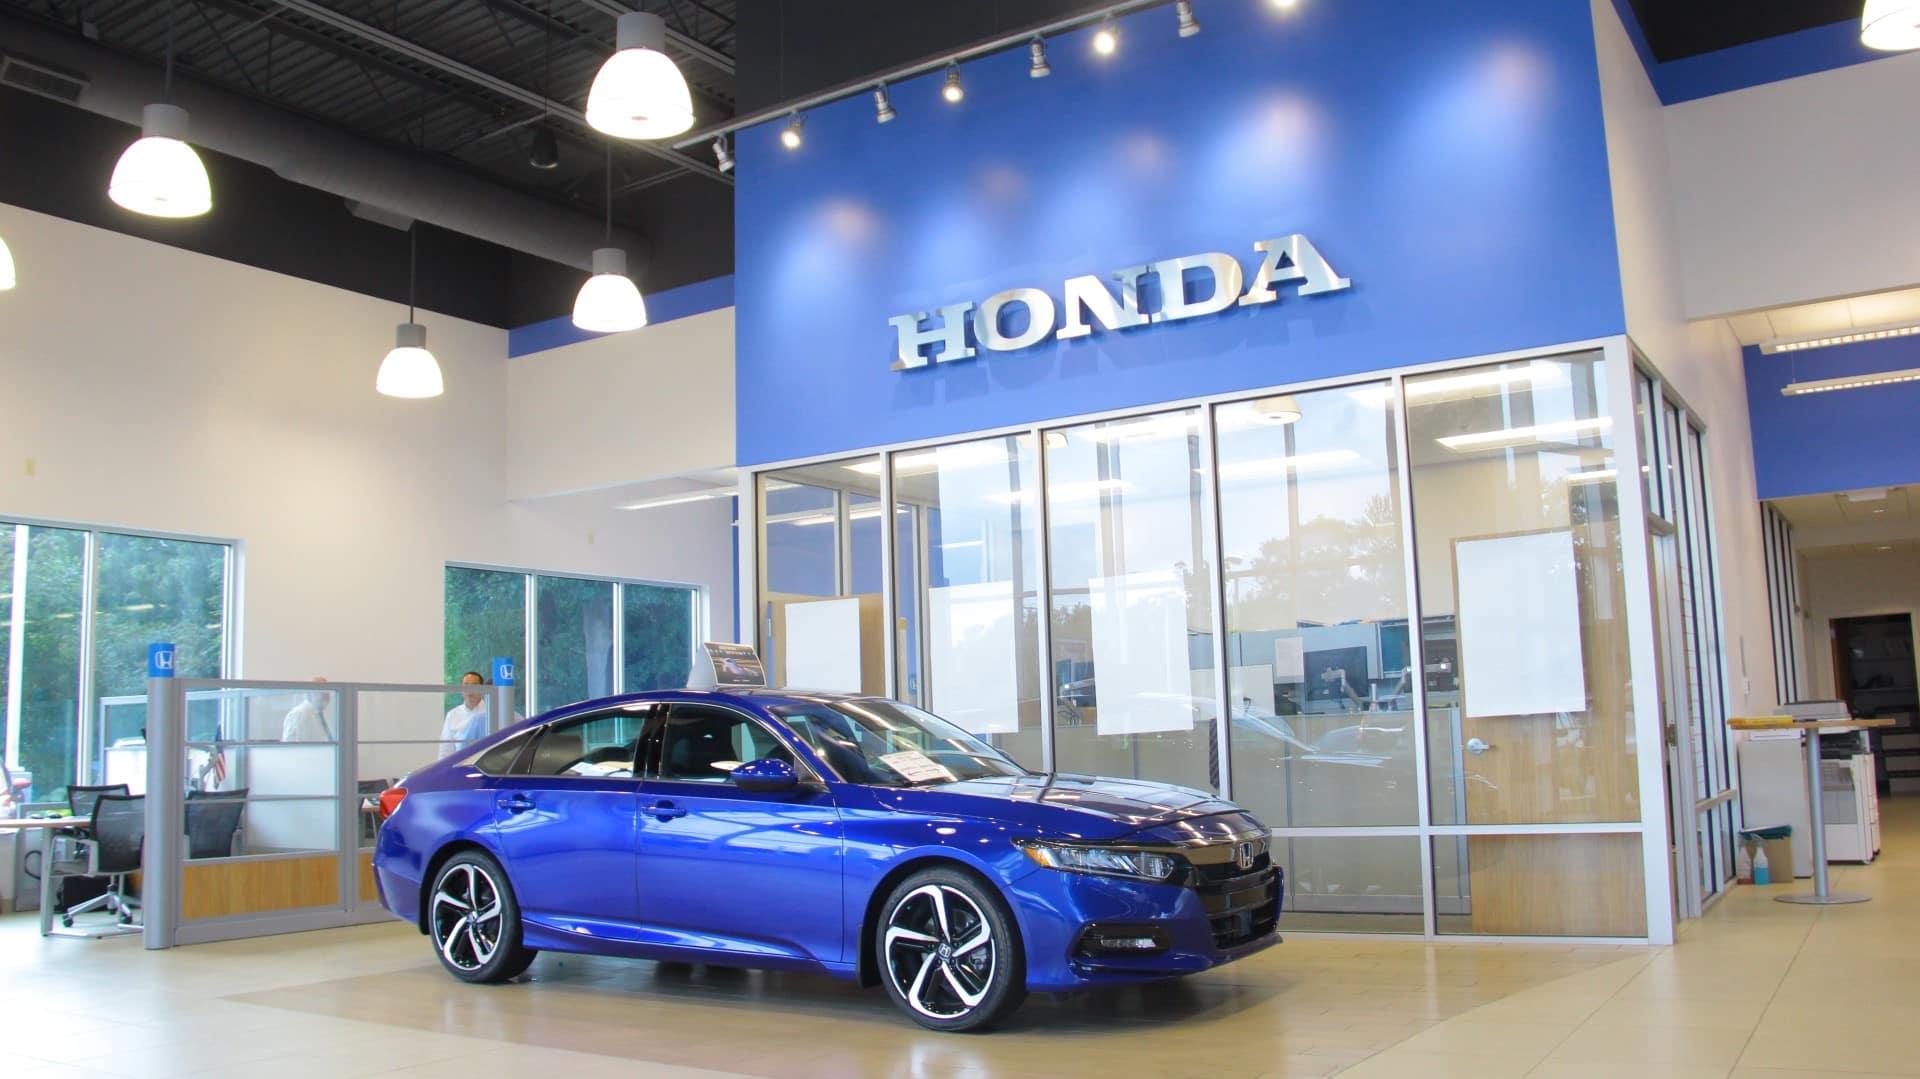 Honda Finance Tower